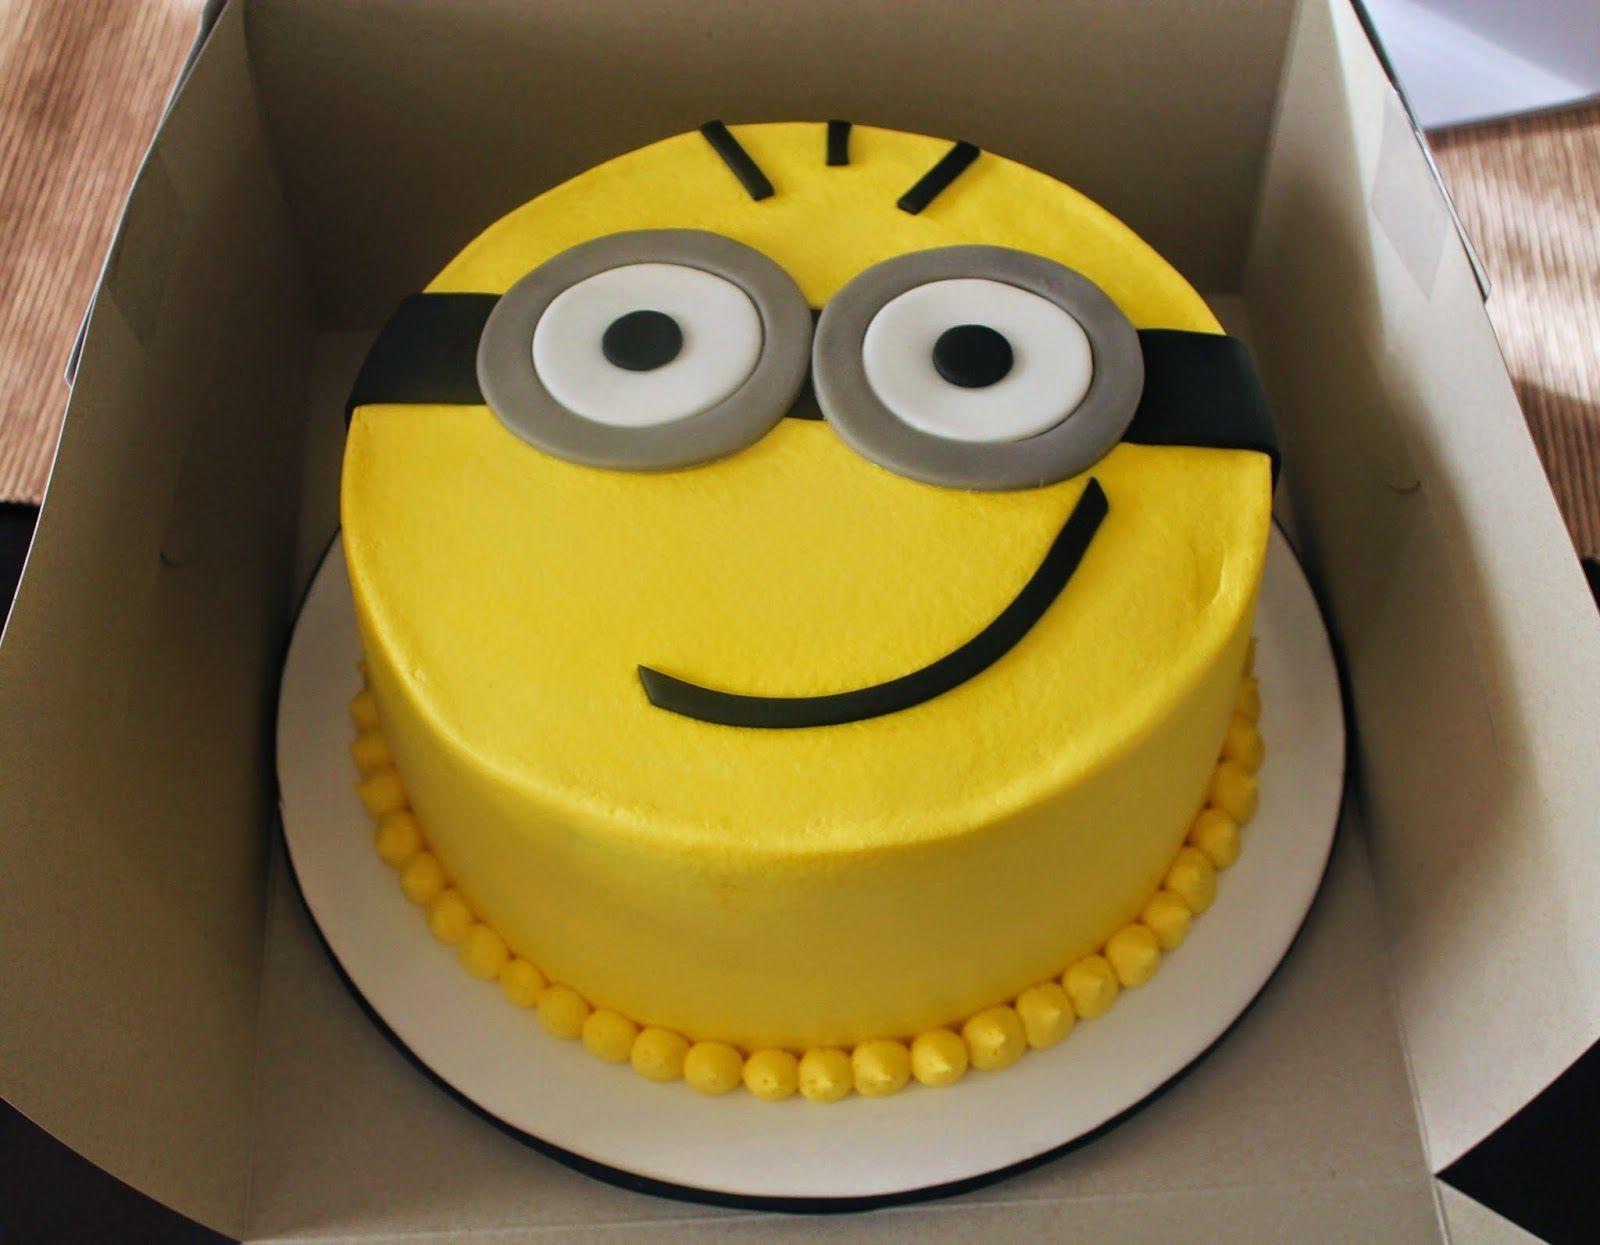 Google themes minions - Minion Cake And Cupcakes Google Search